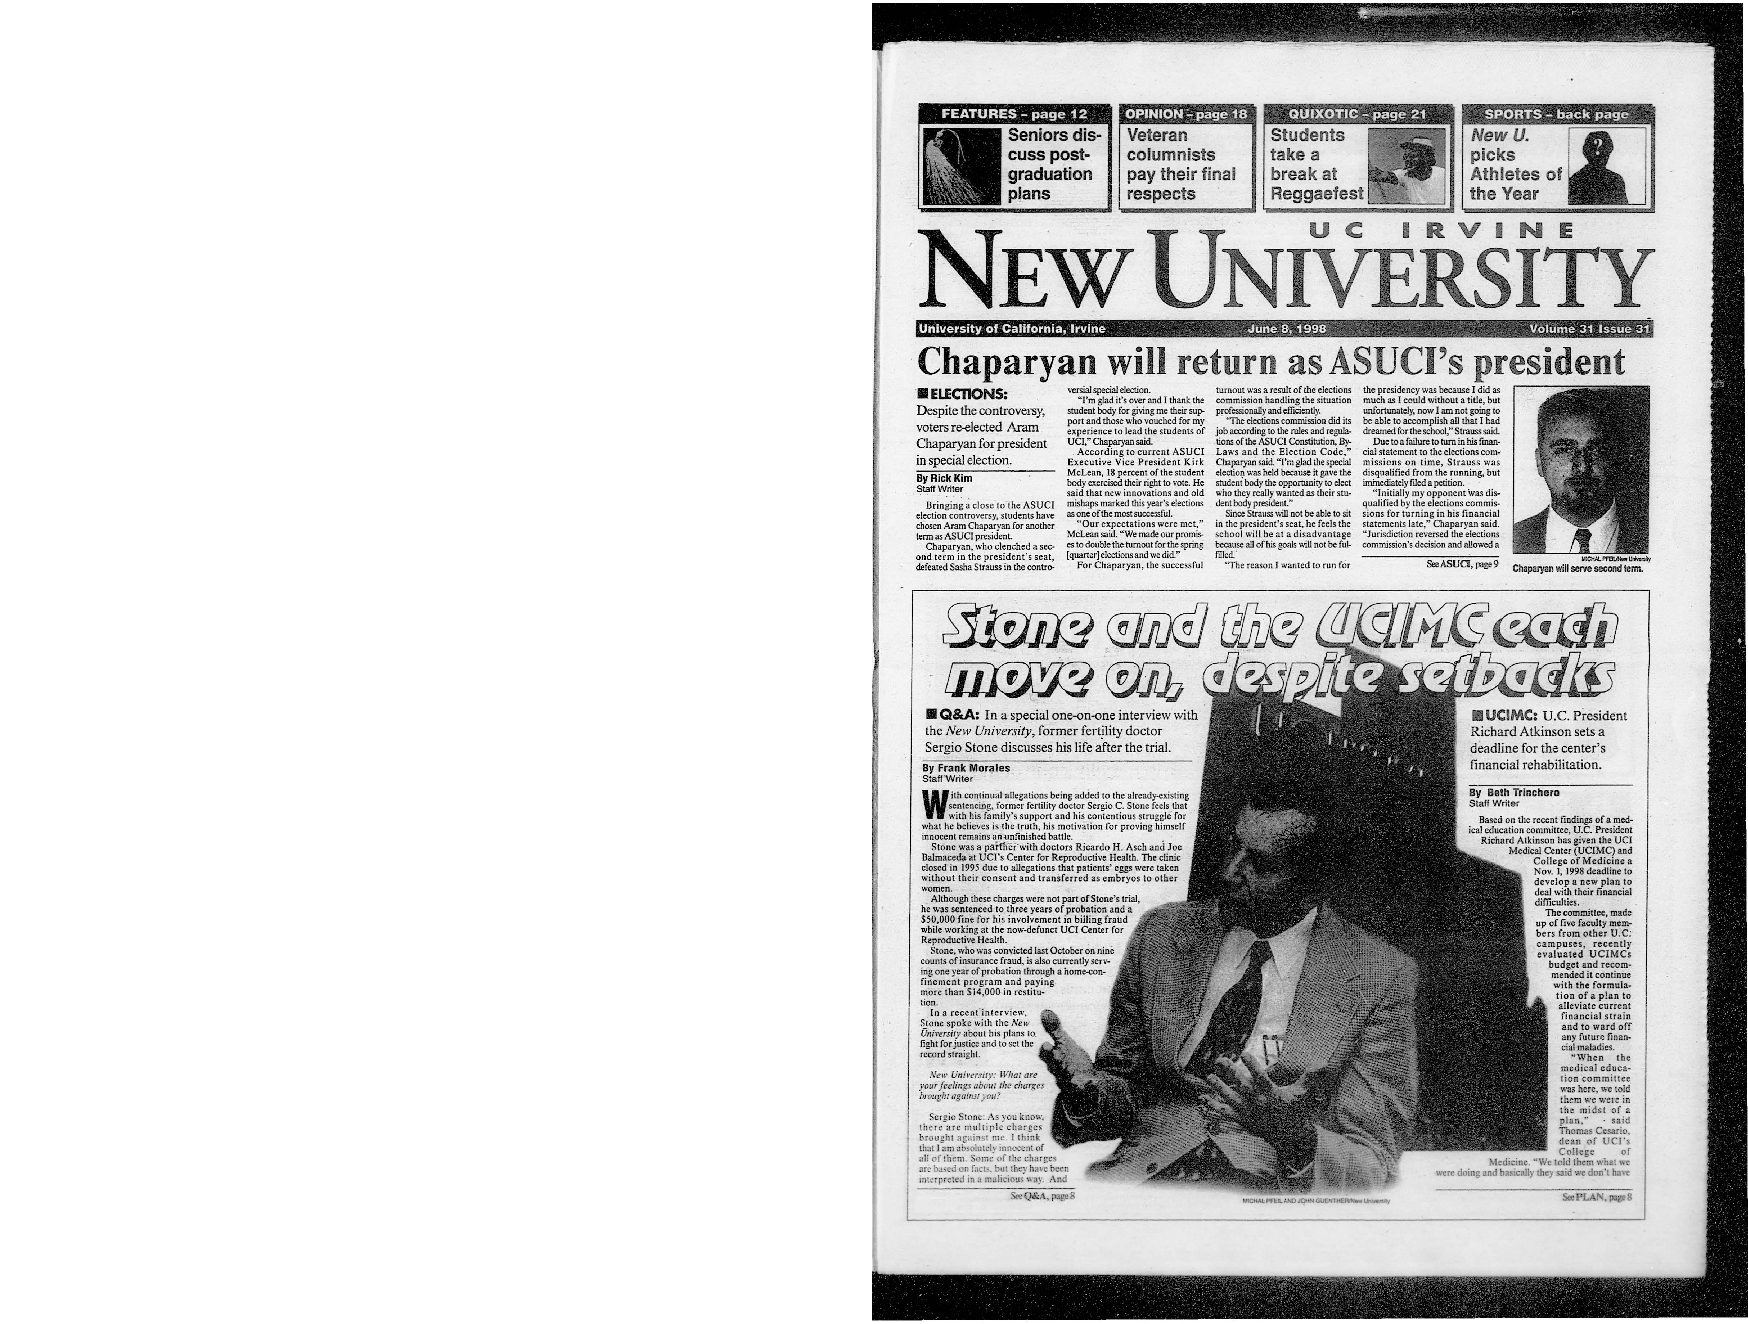 New University (Irvine, Calif.), Vol. 31, No. 31